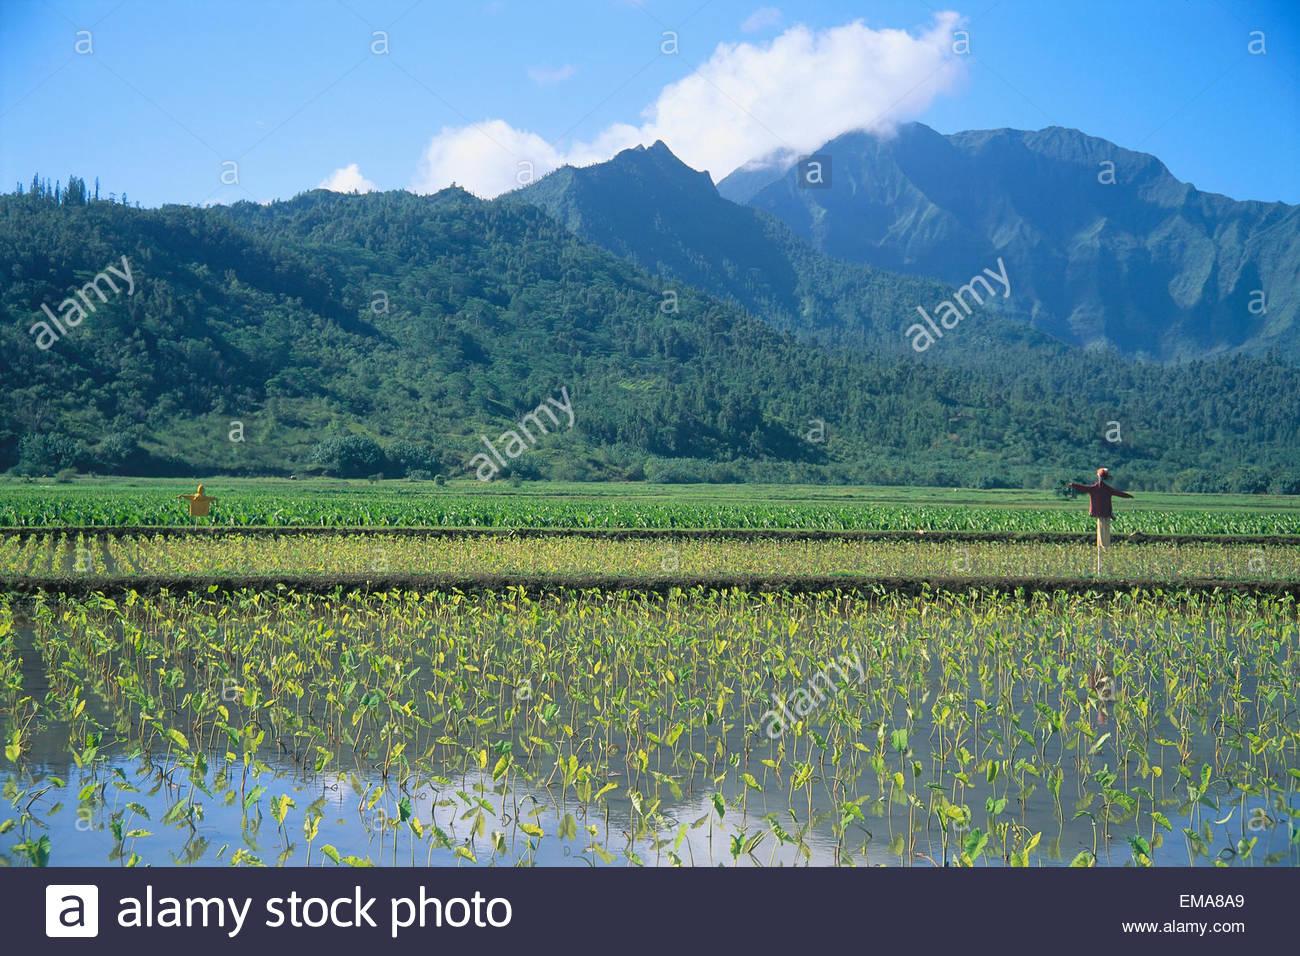 Hawaii Kauai Hanalei Valley Taro Field With Scarecrows 1300x956